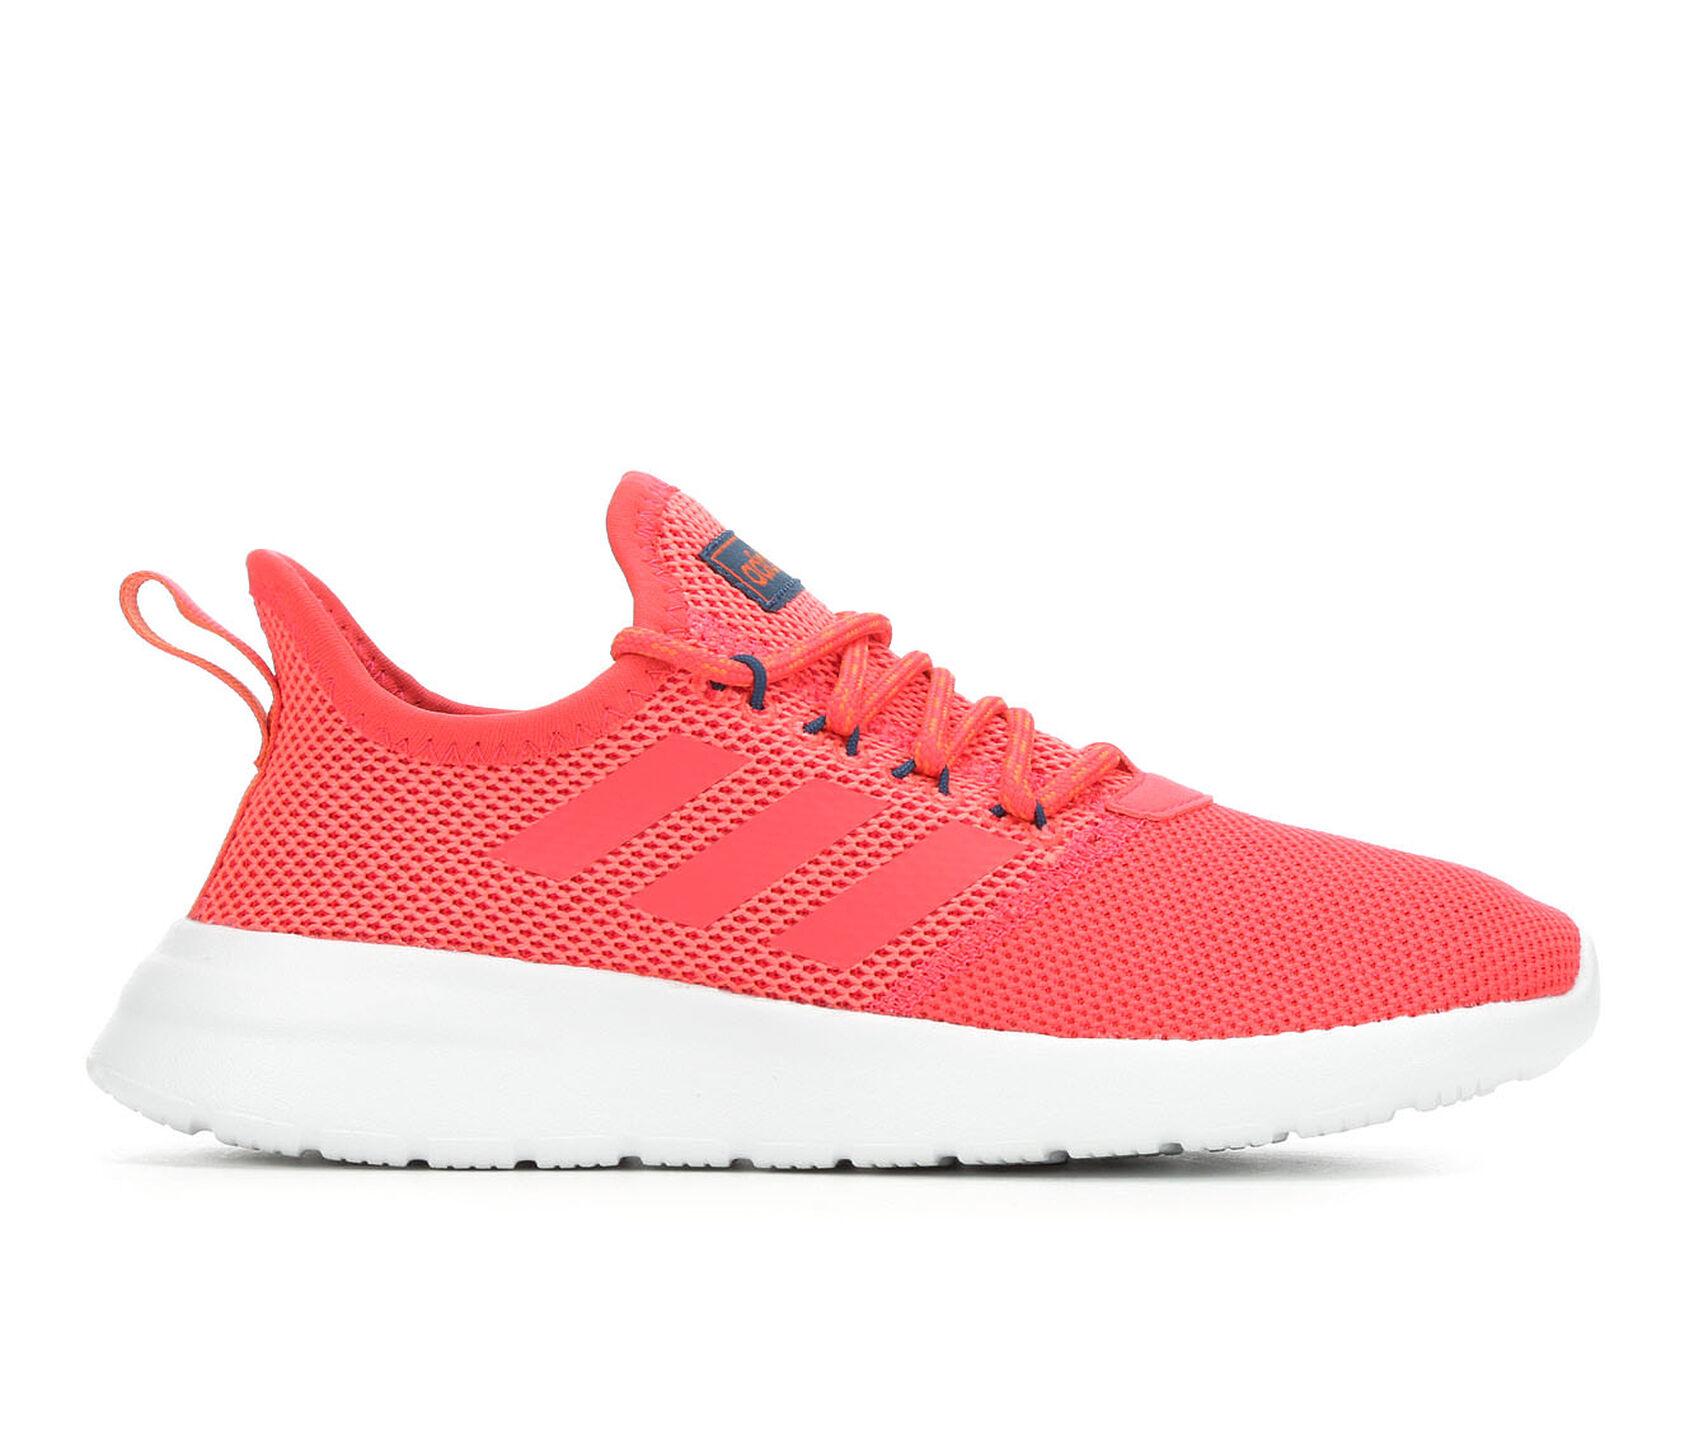 huge discount 42283 b5722 Women s Adidas Lite Racer Reborn Sneakers   Shoe Carnival